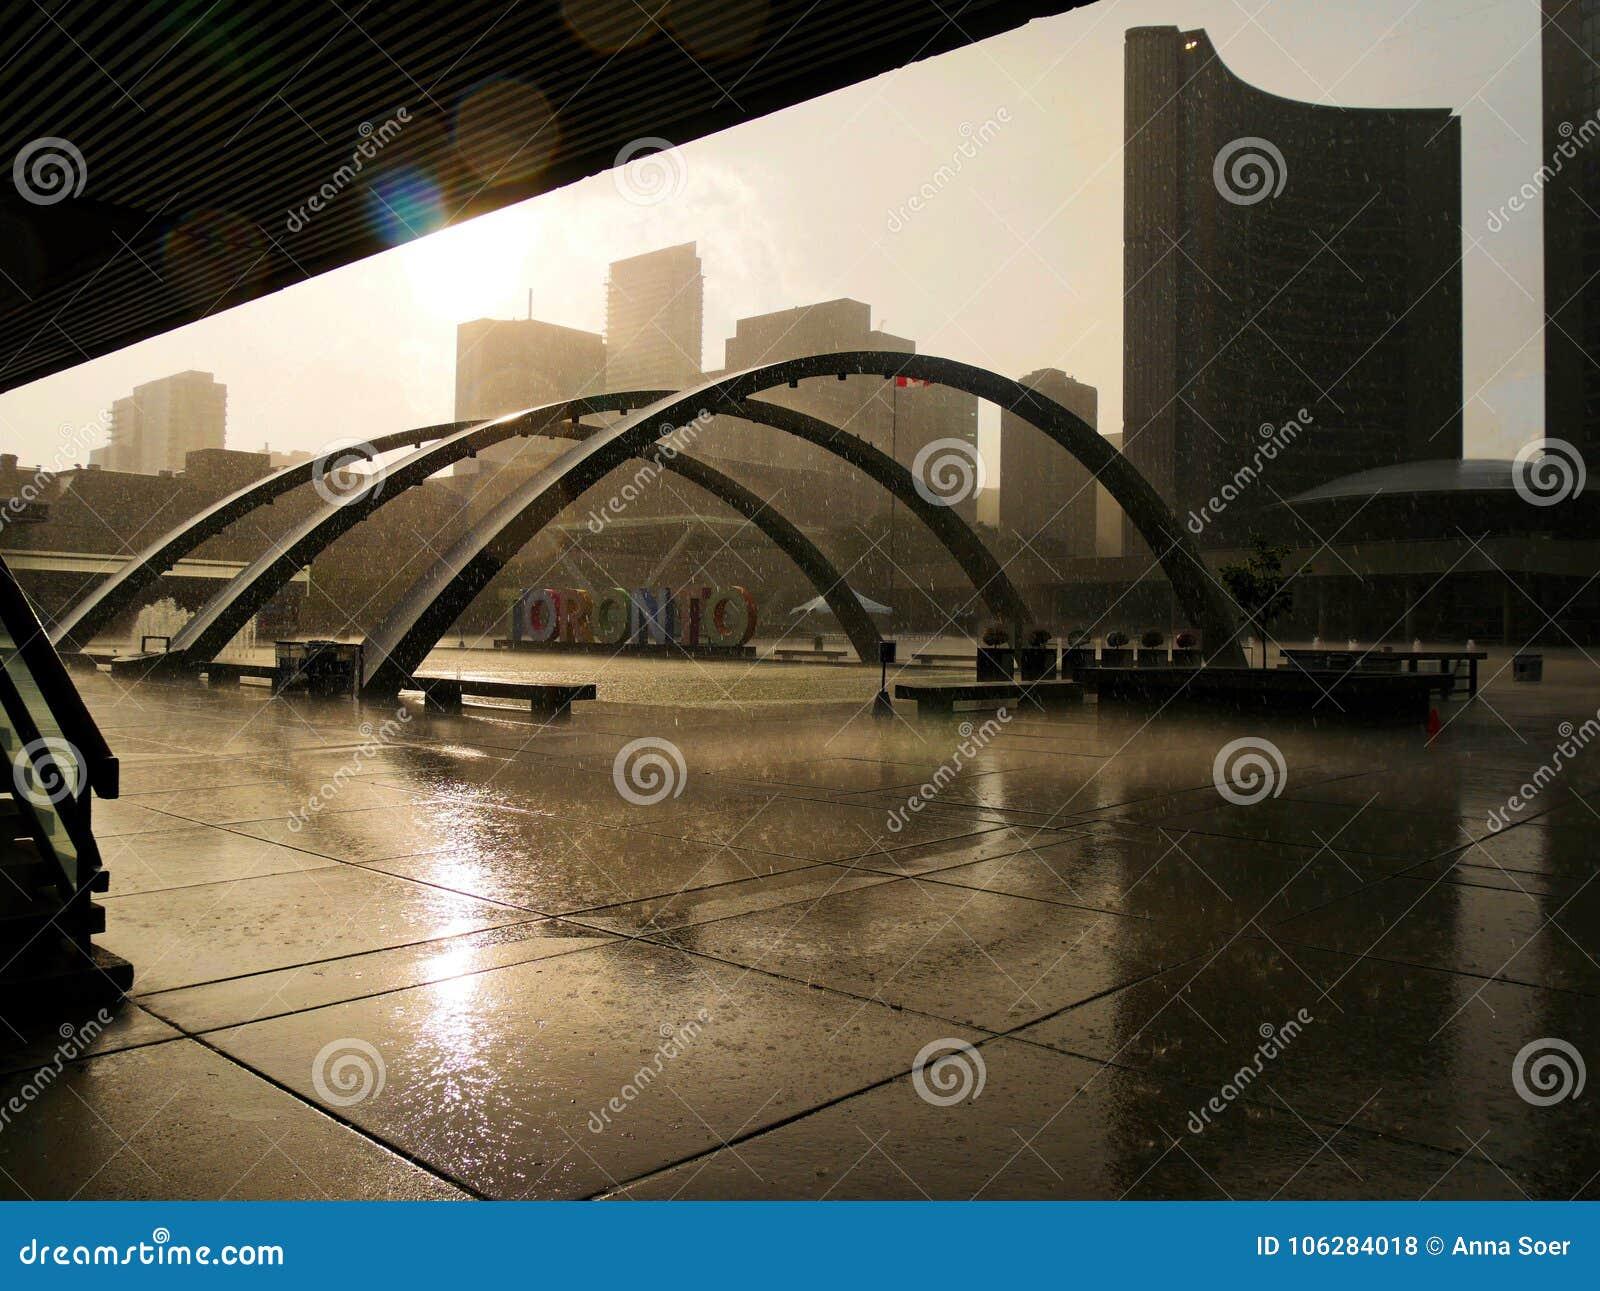 Toronto under the rain